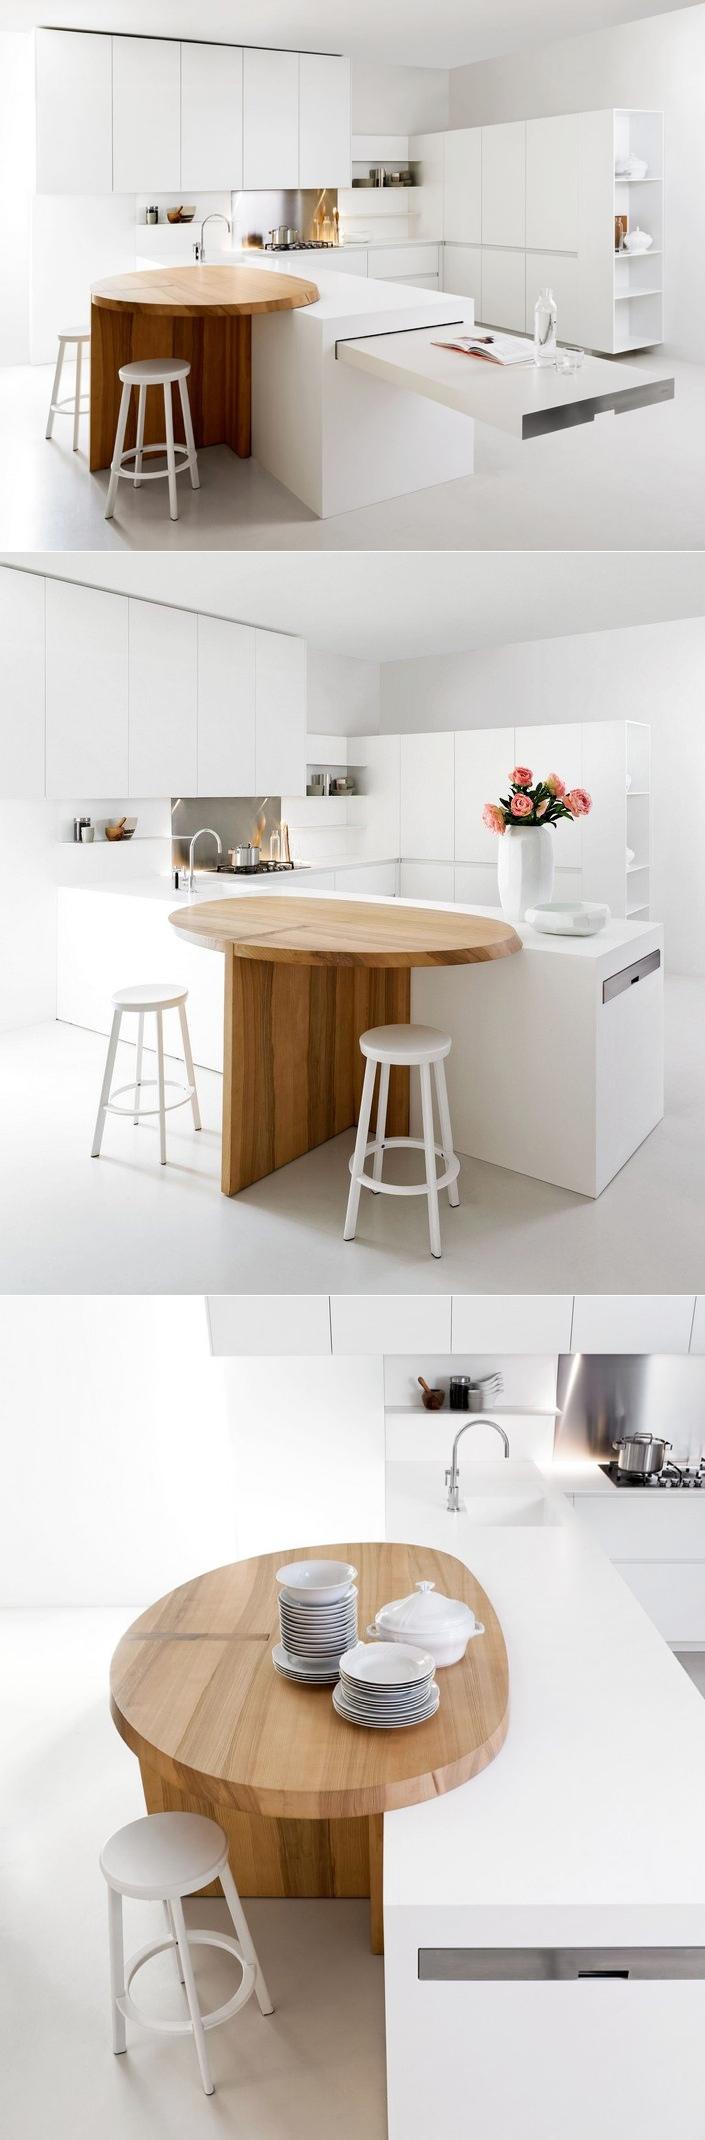 25 Unique Kitchen Countertops - photo#18